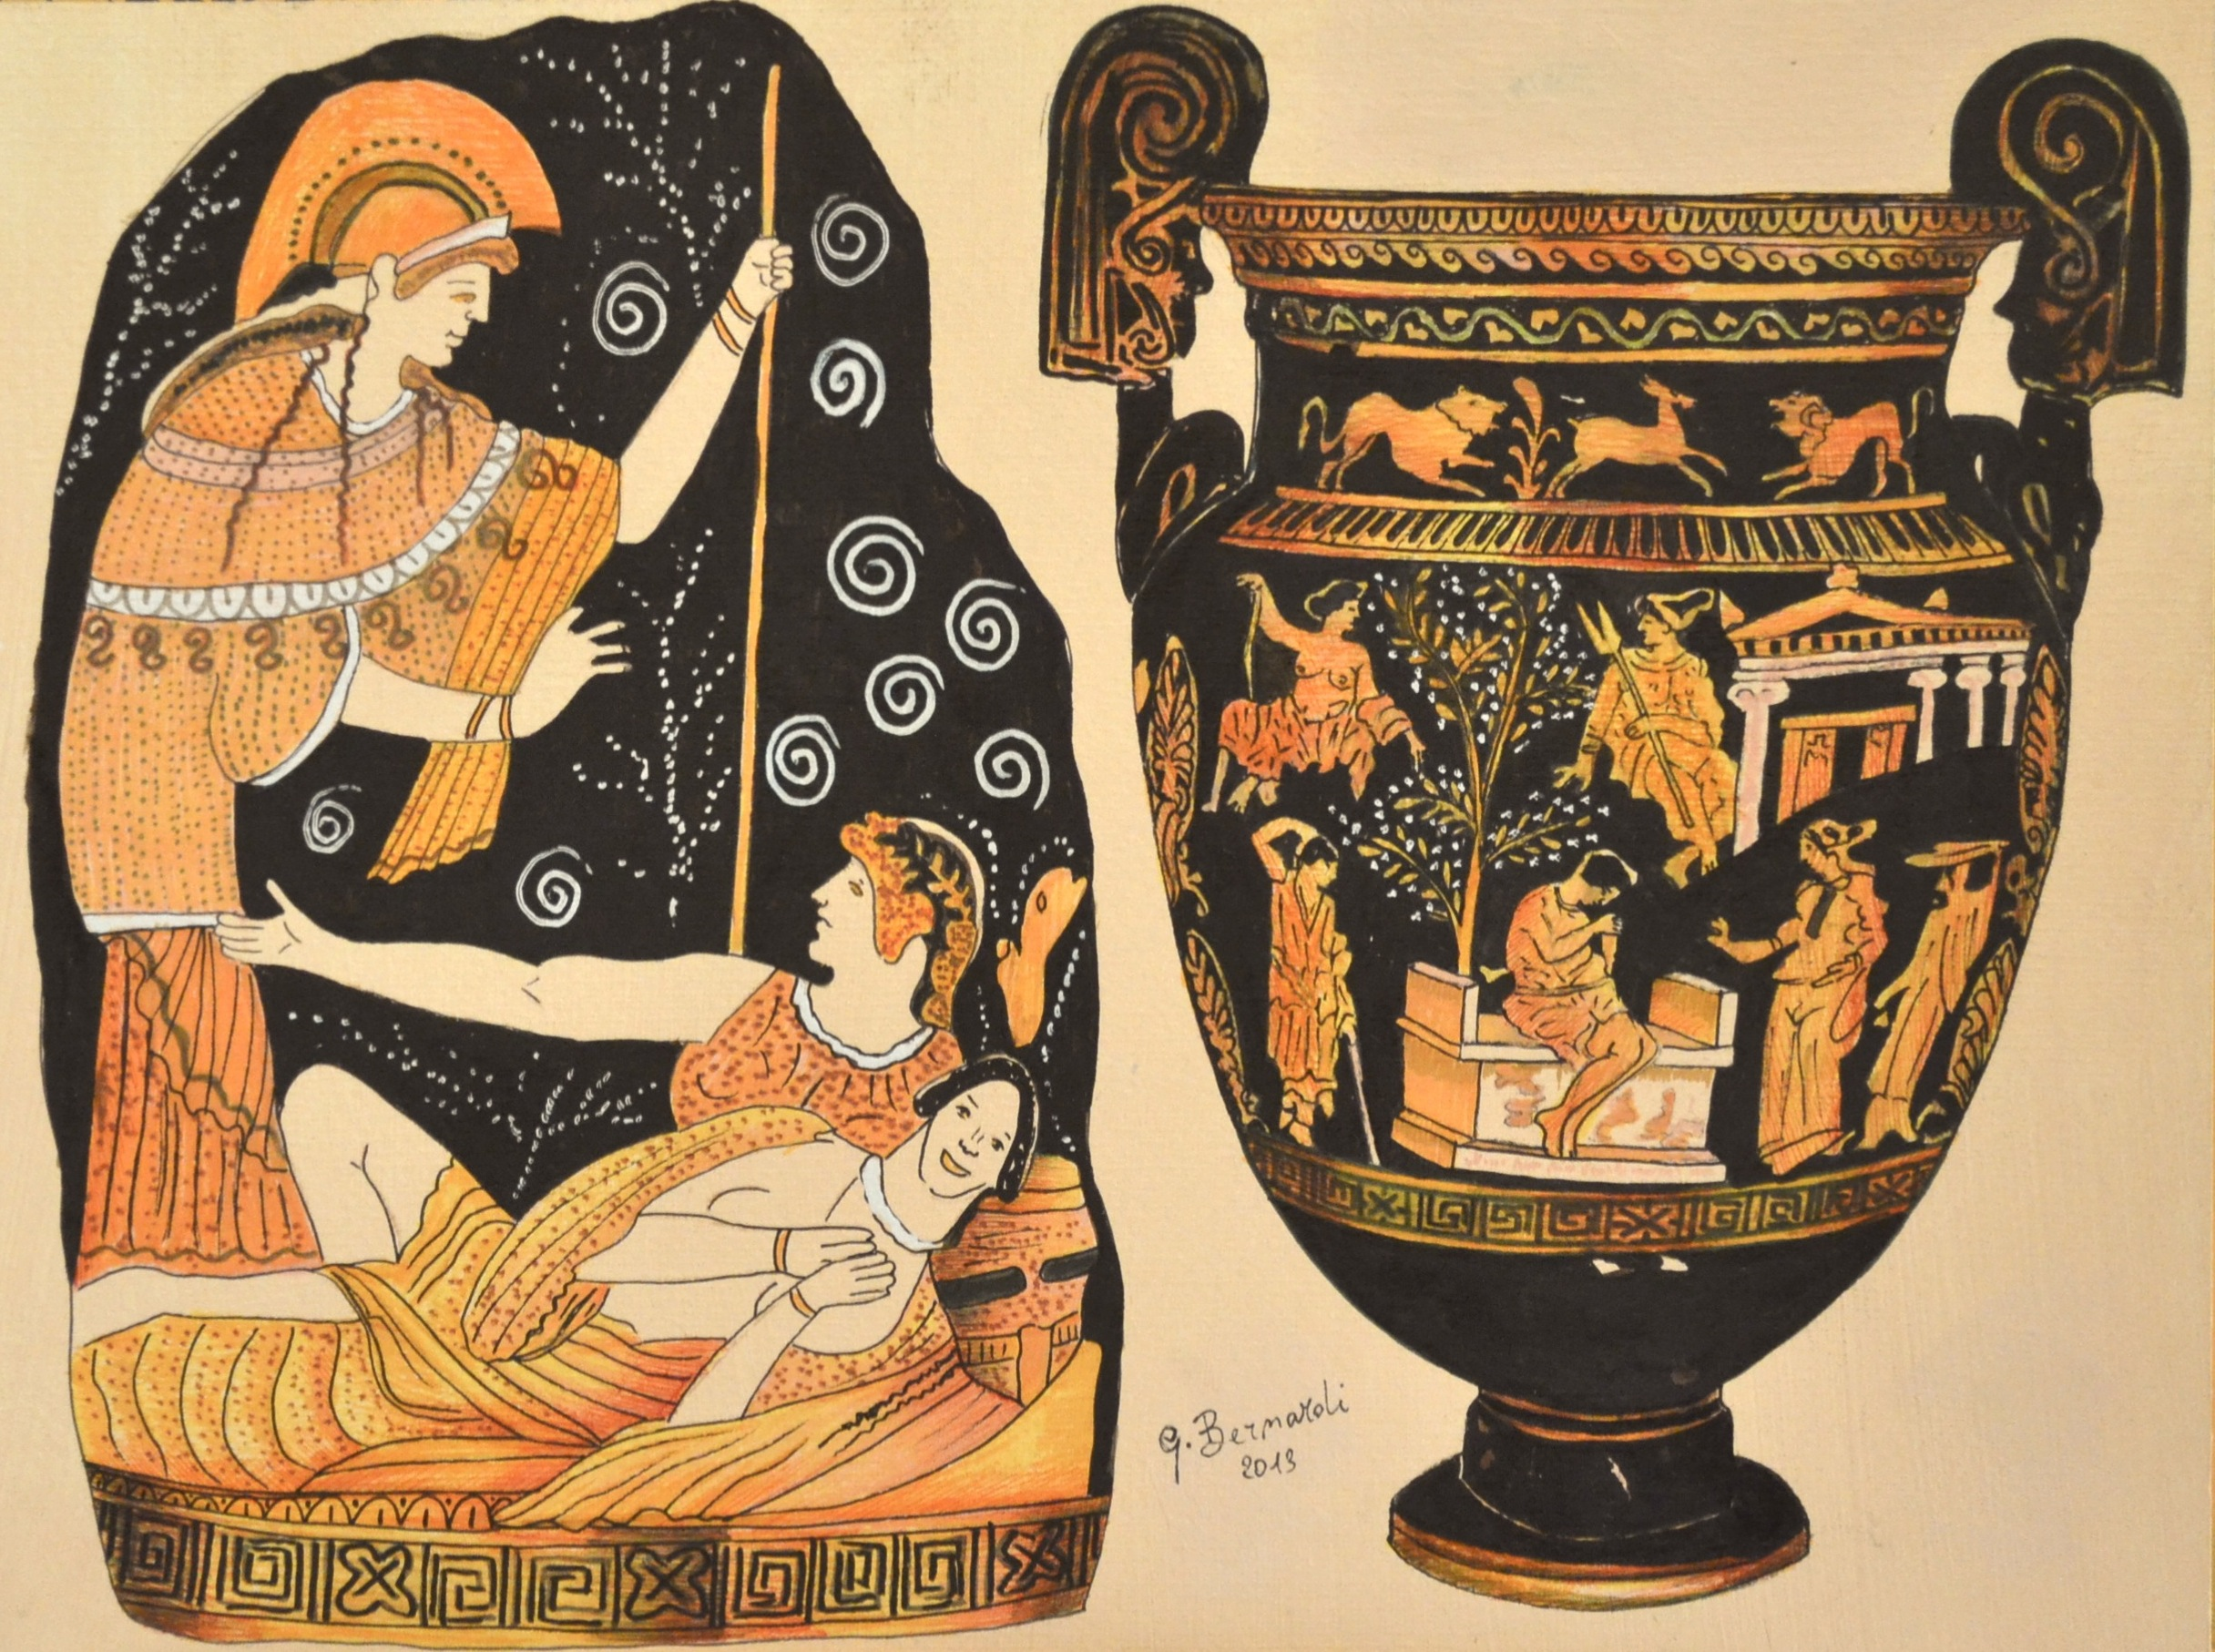 Vasi greci giovanni bernardi opera celeste network for Vasi antica grecia